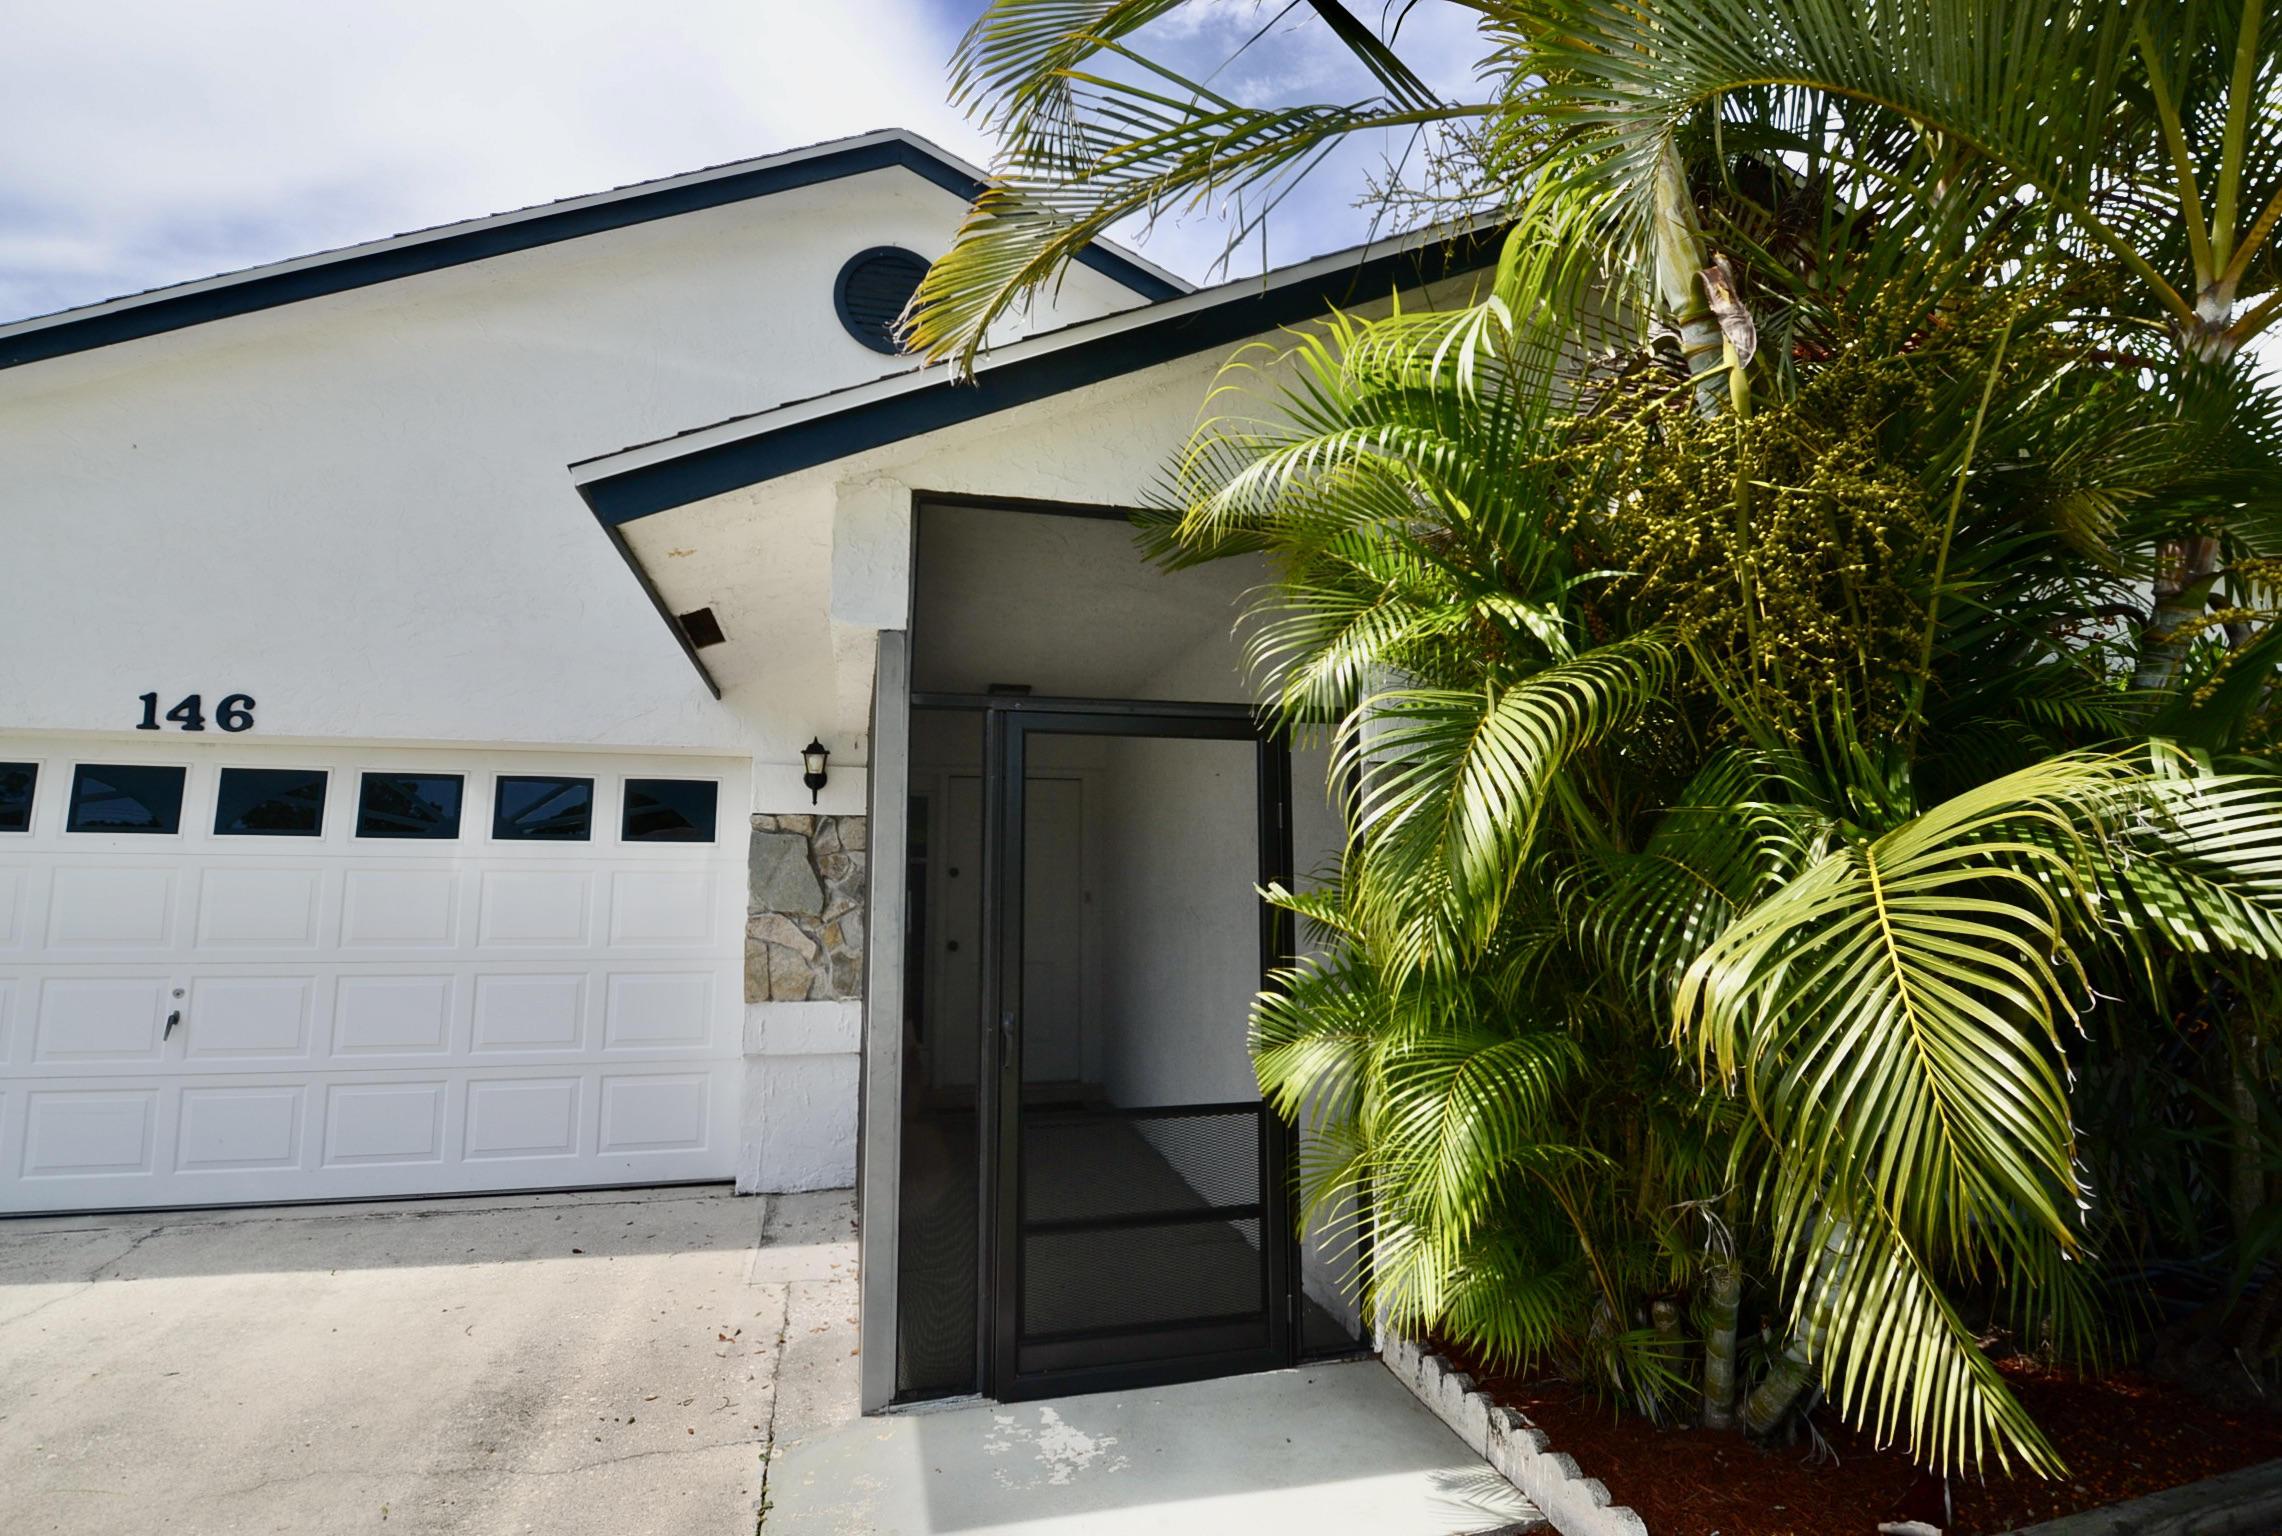 146 Sunflower Circle  Royal Palm Beach, FL 33411